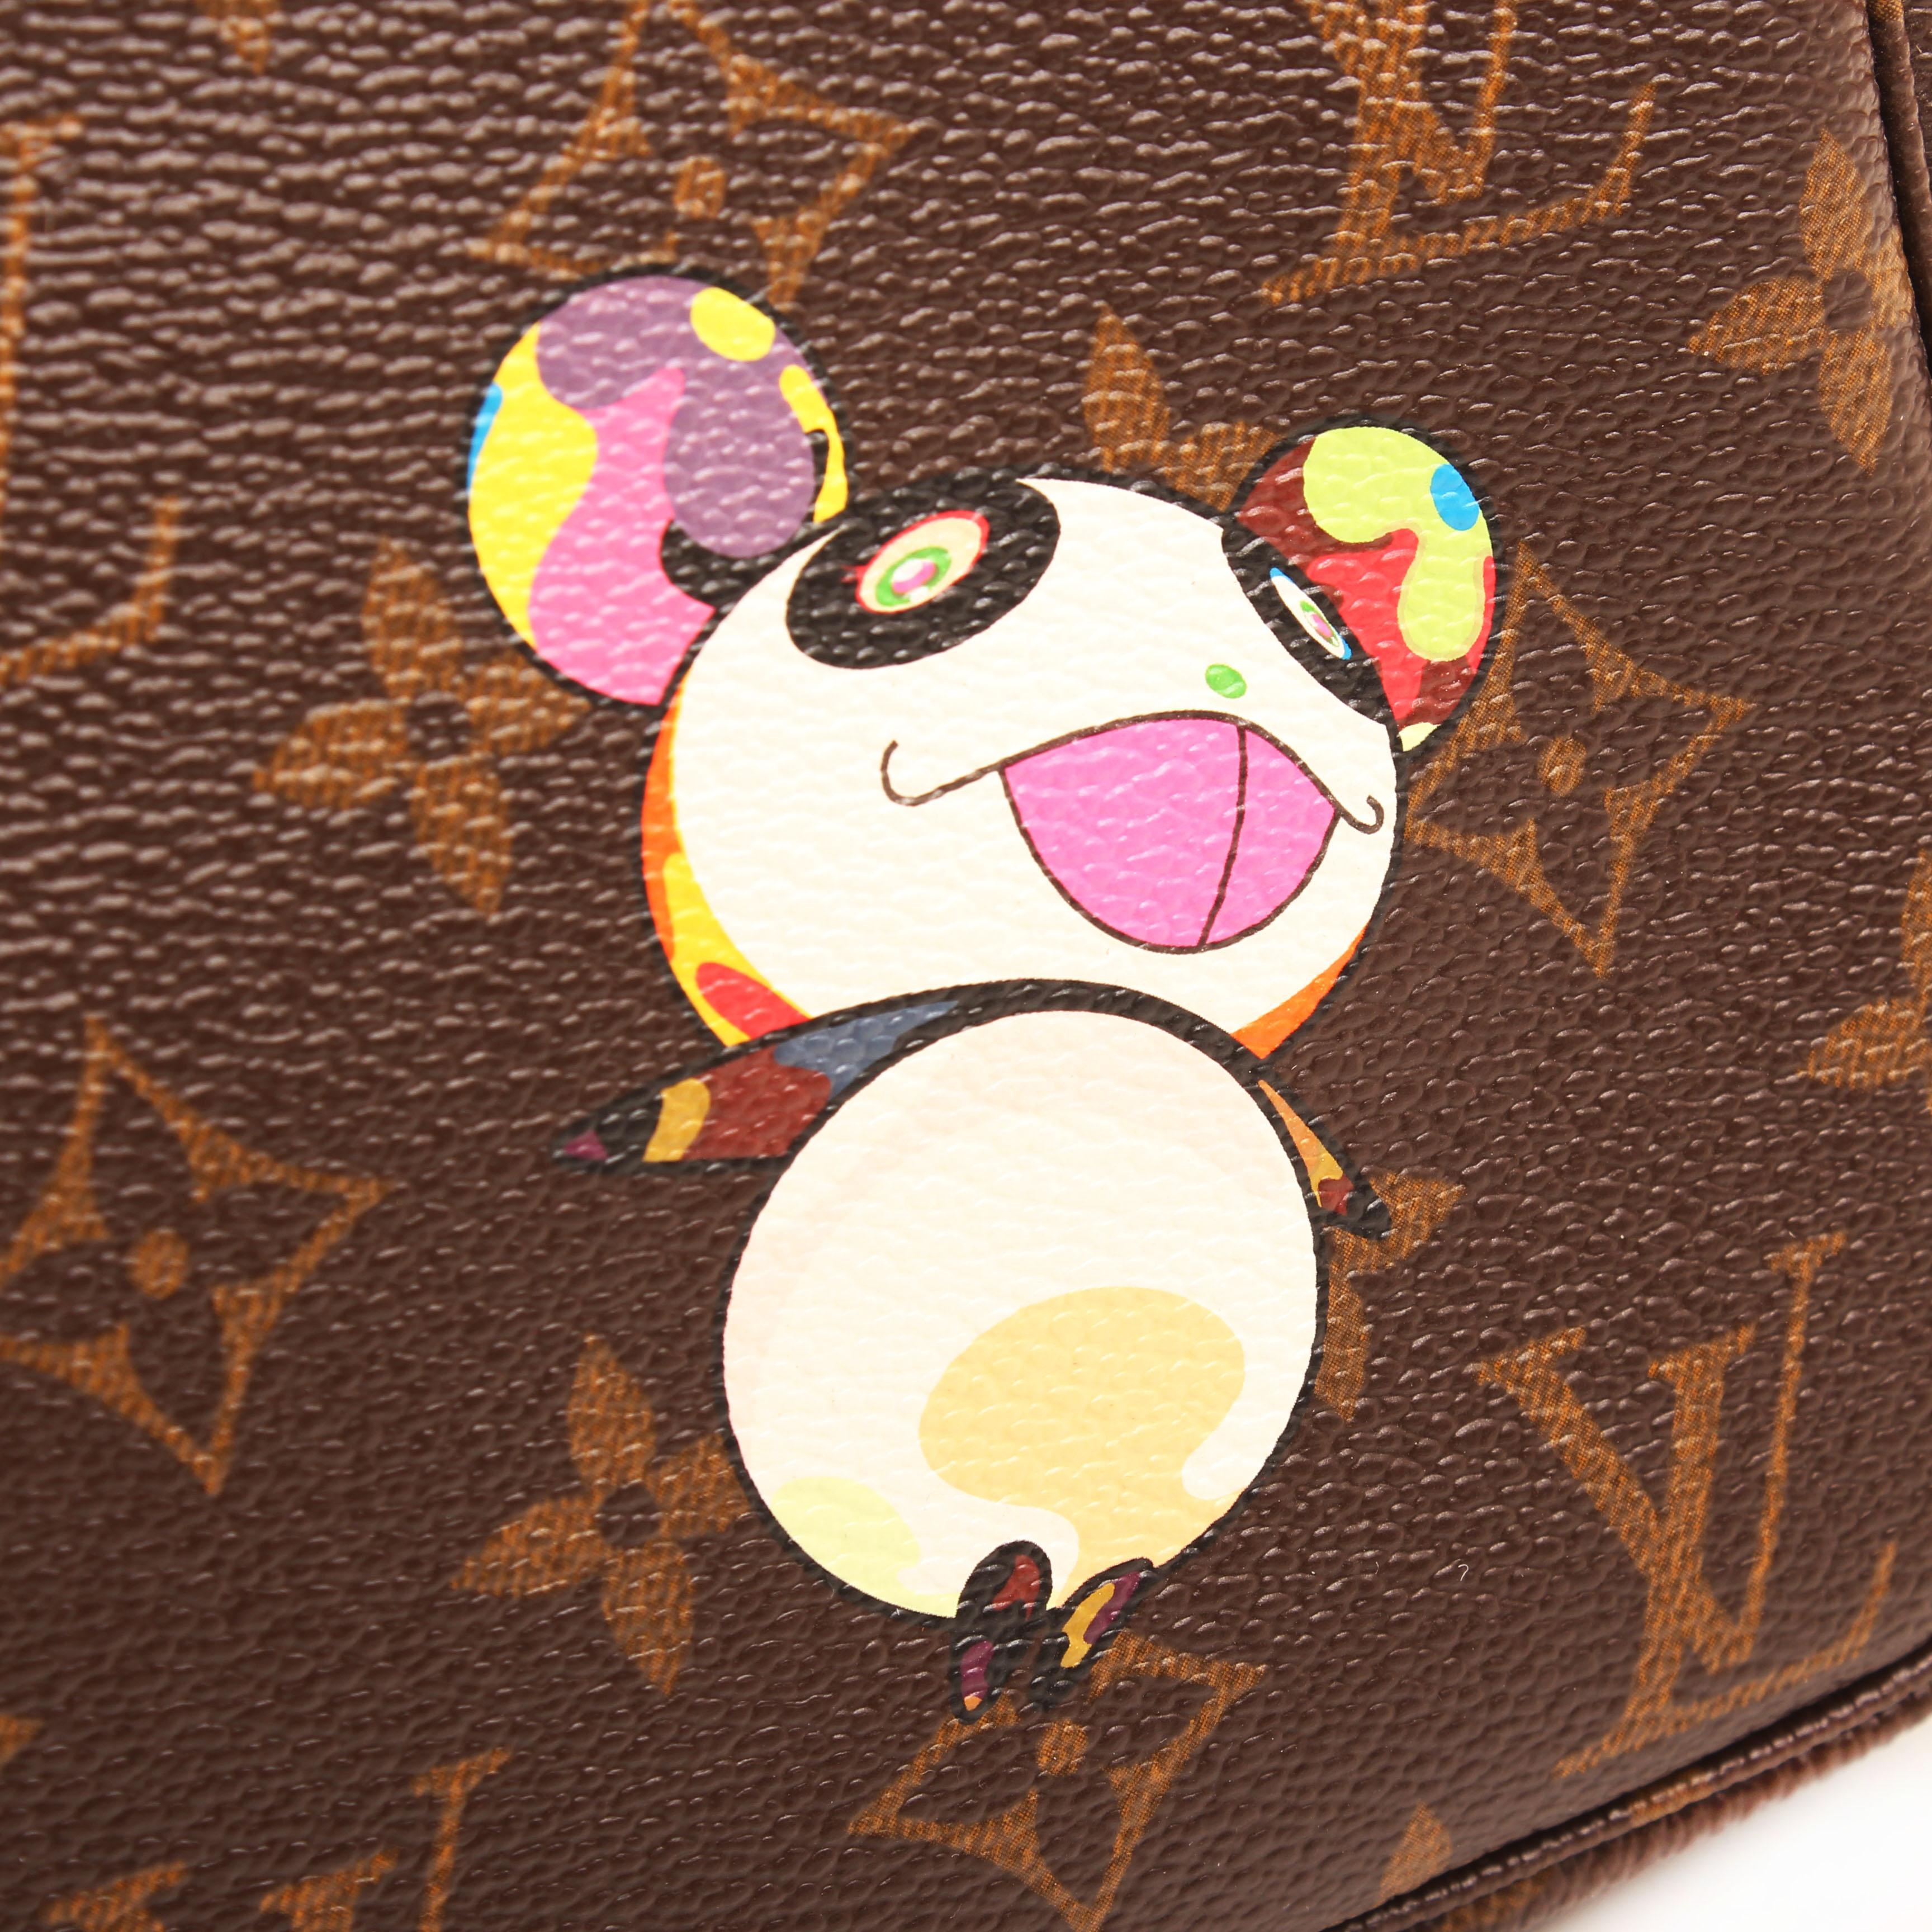 louis vuitton pochette accessoires nm murakami panda monogram ilustracion